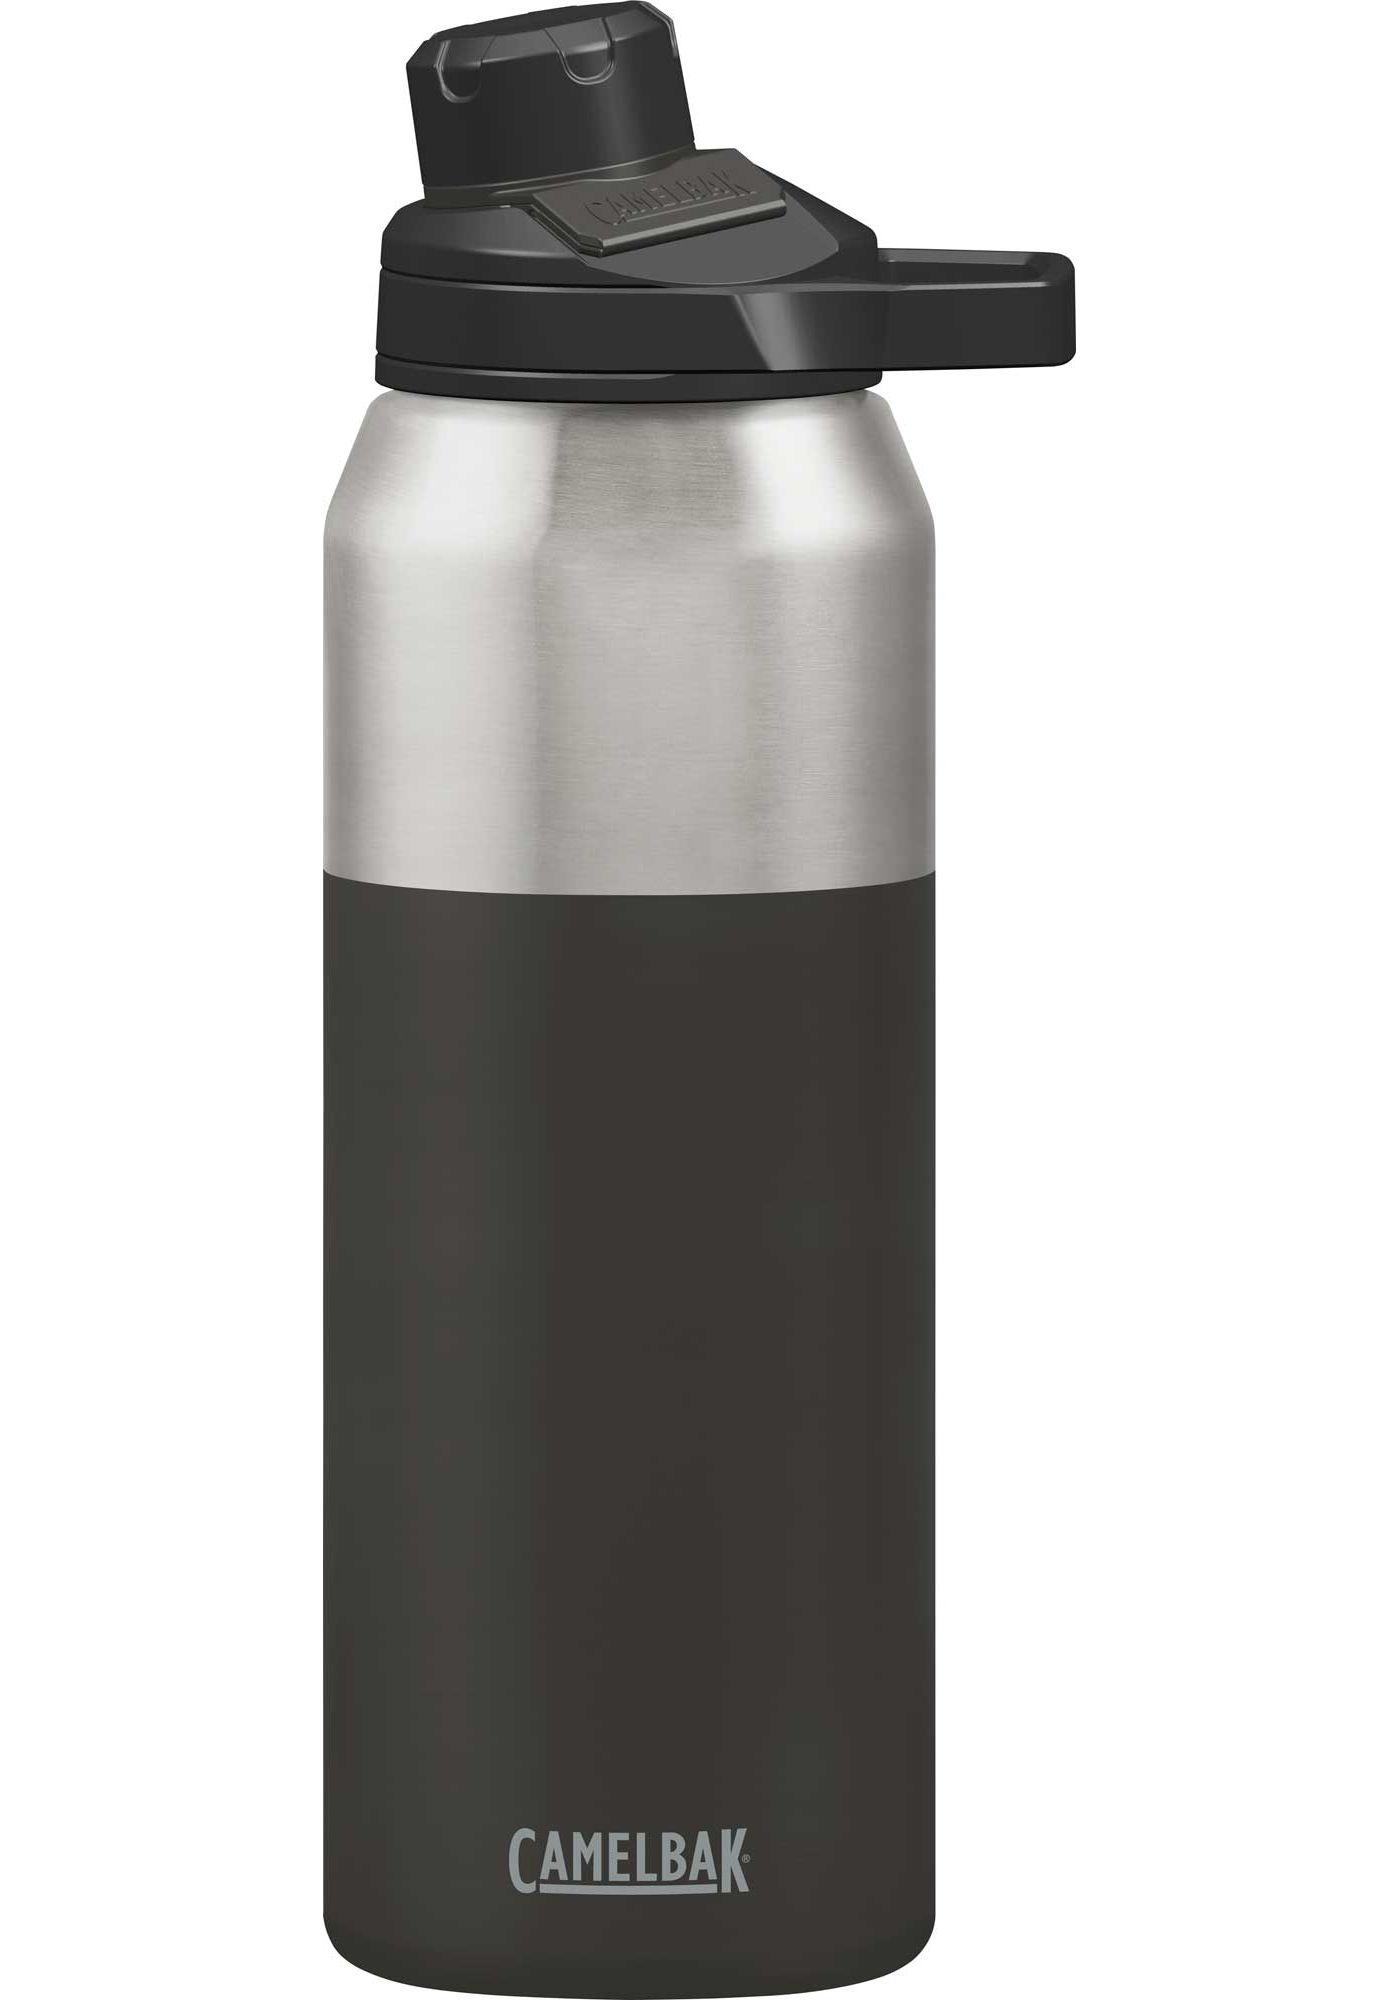 Camelbak Chute Mag Vacuum 32 oz. Bottle